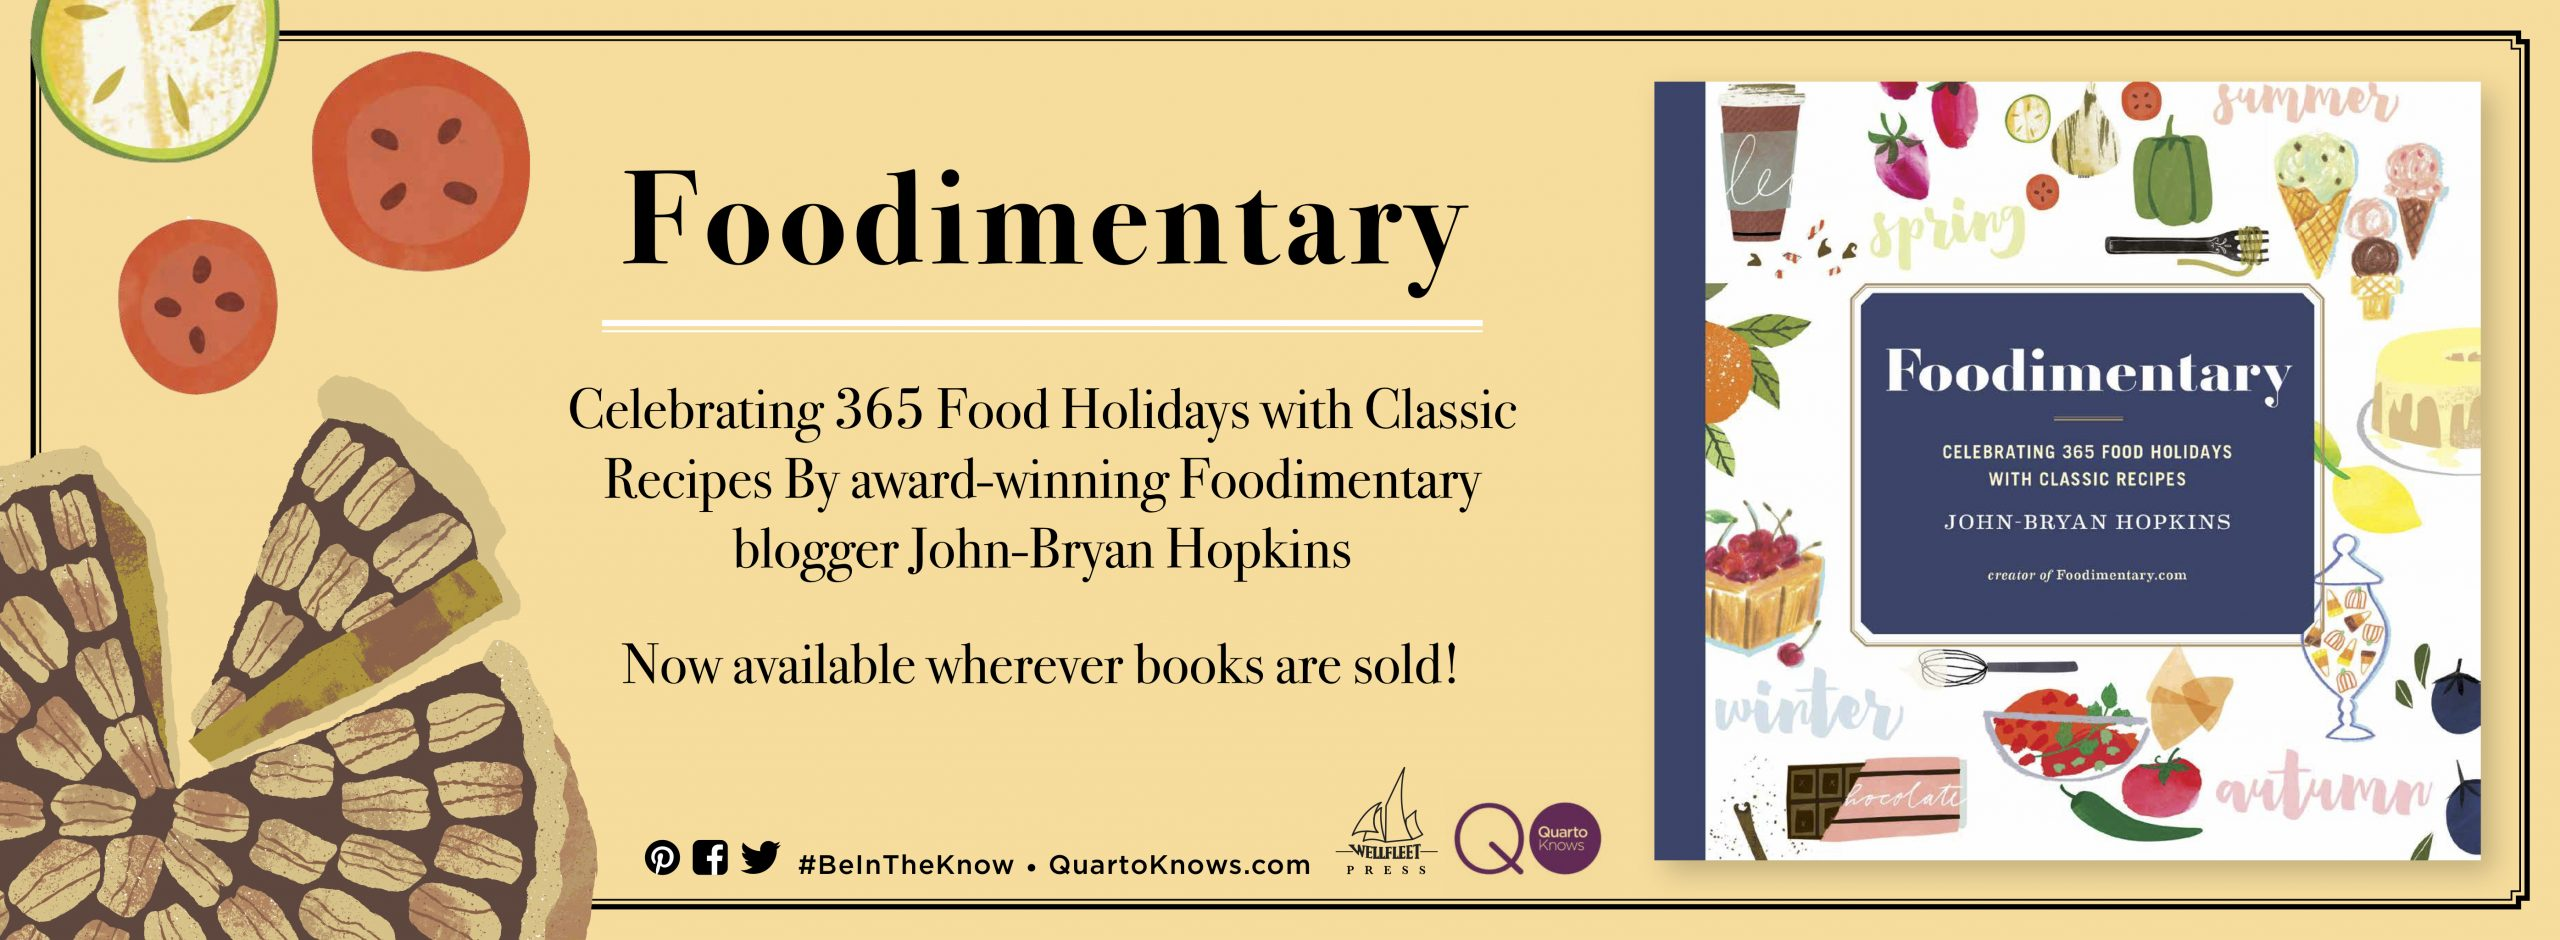 January Holidays | Foodimentary - National Food Holidays